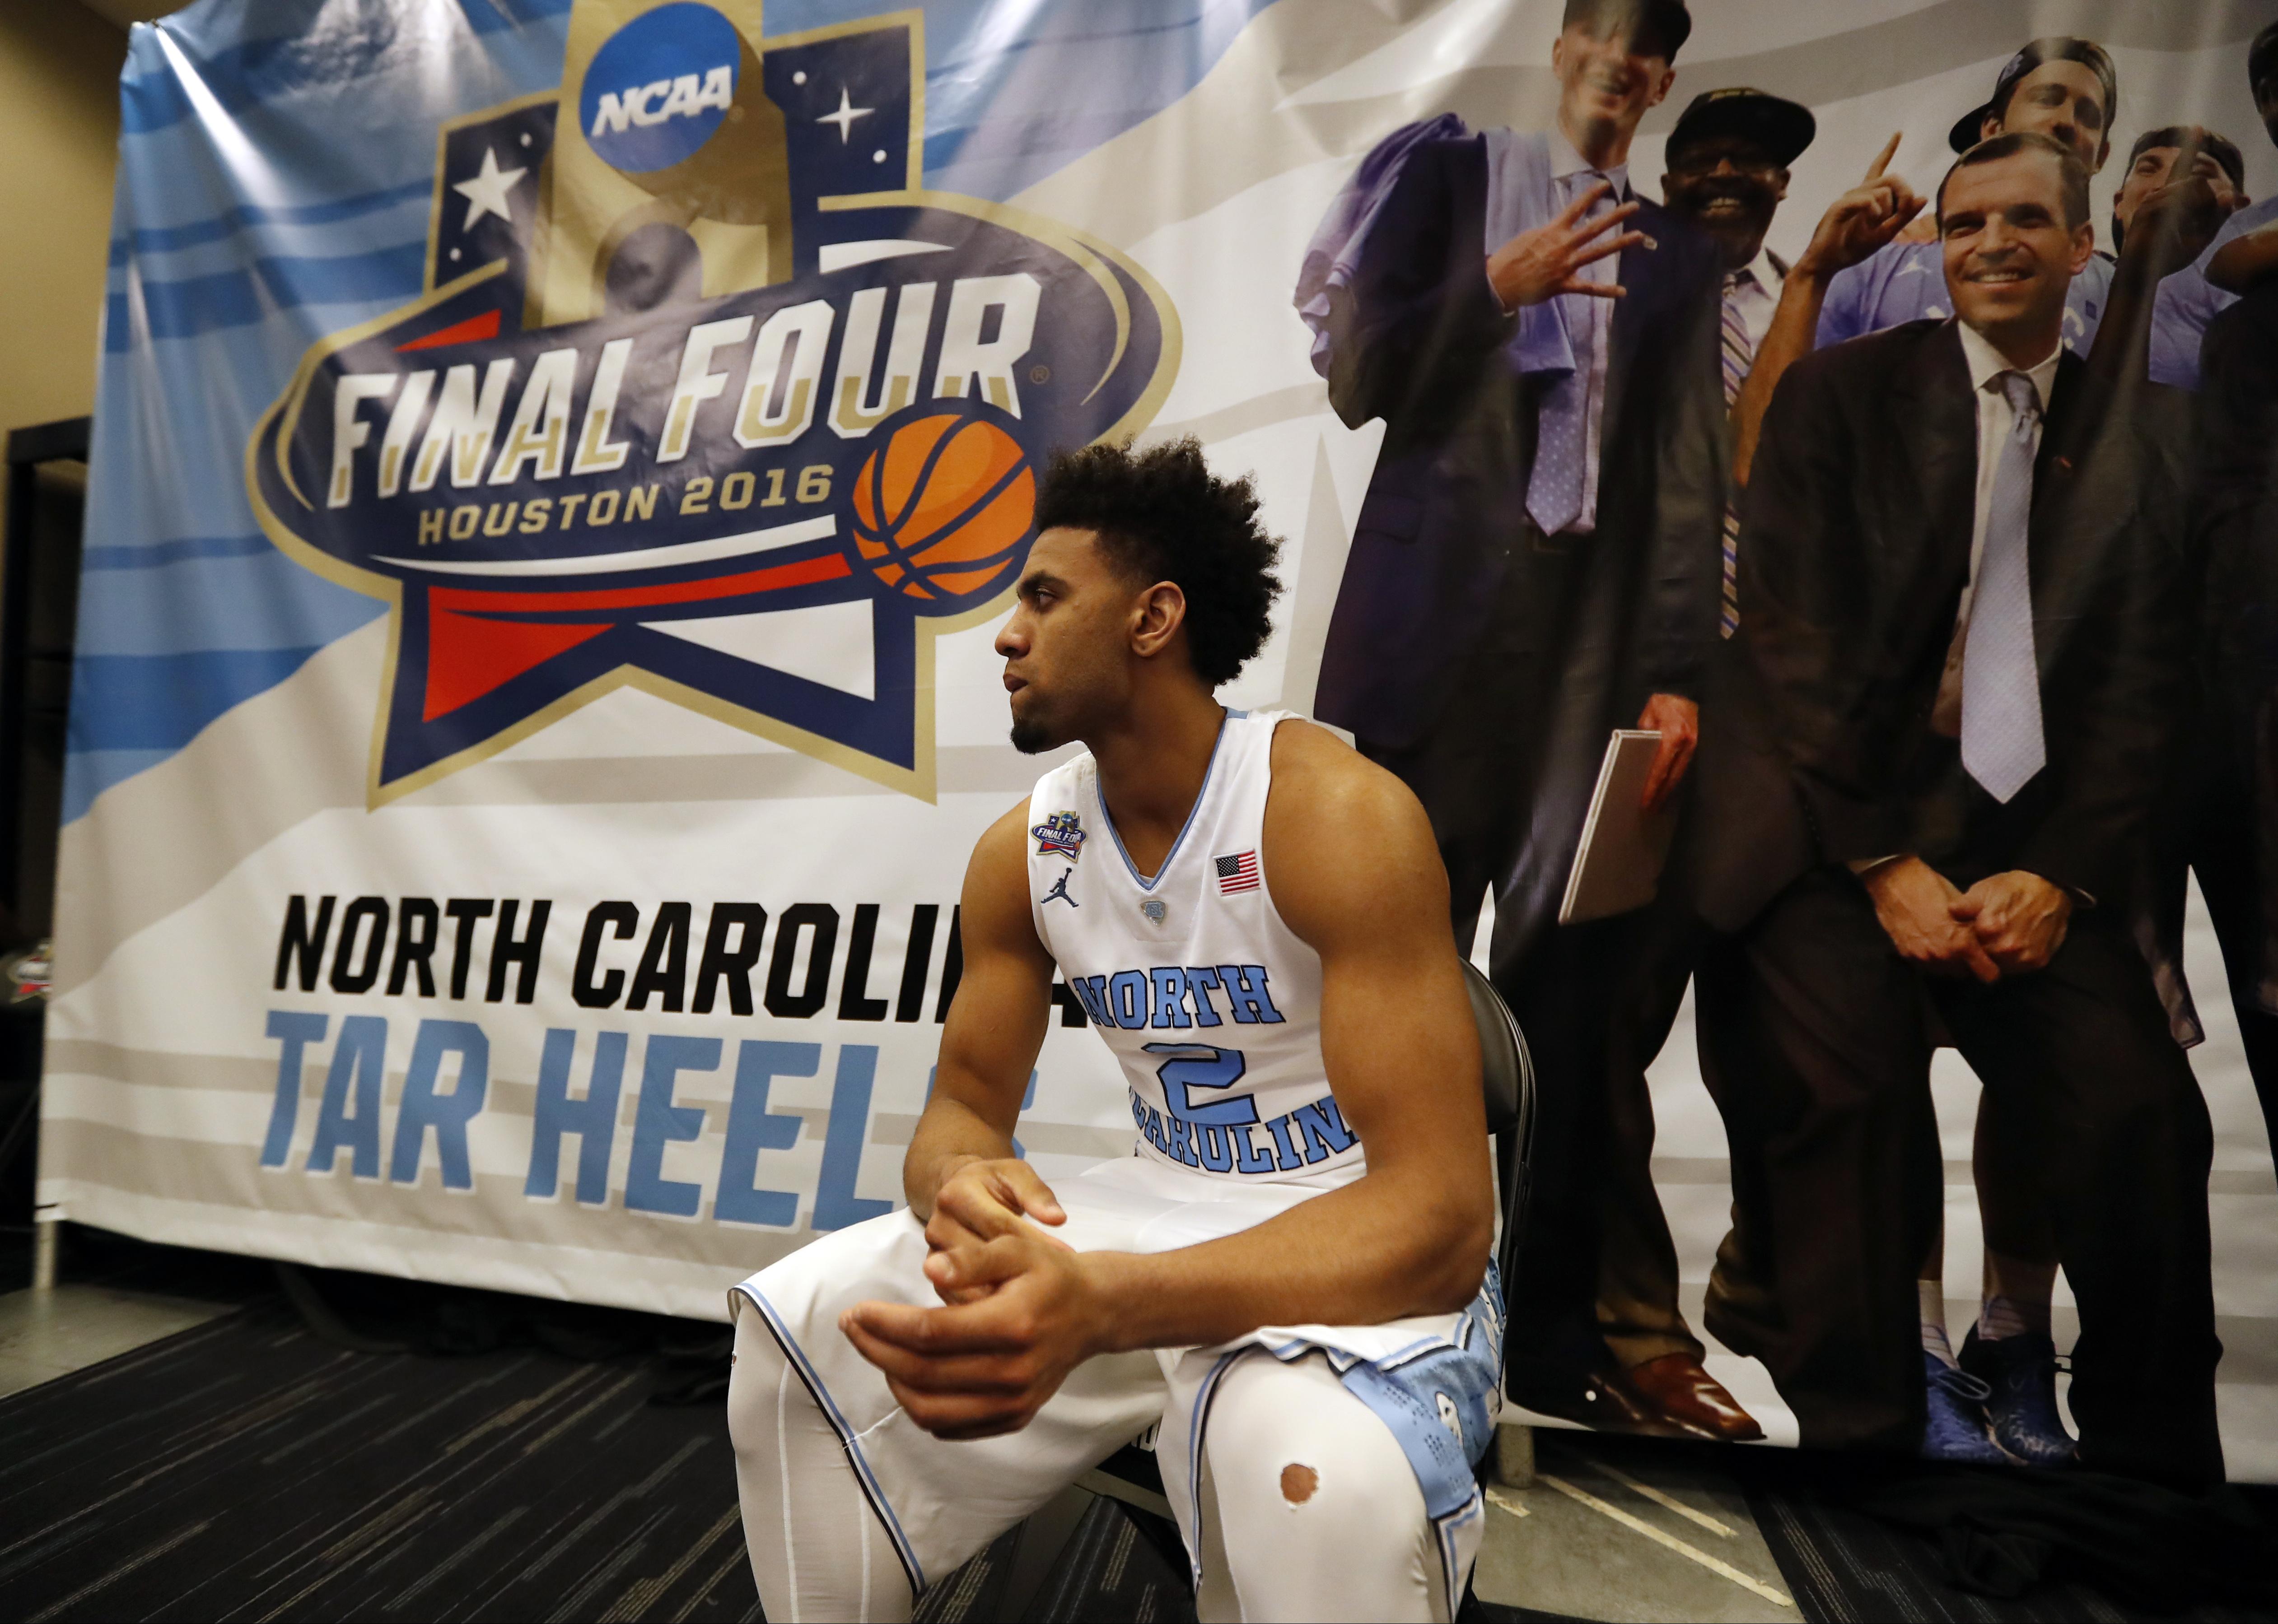 North Carolina's Joel Berry II sits after the NCAA Final Four tournament college basketball championship game against Villanova, Monday, April 4, 2016, in Houston. Villanova won 77-74. (AP Photo/Eric Gay)